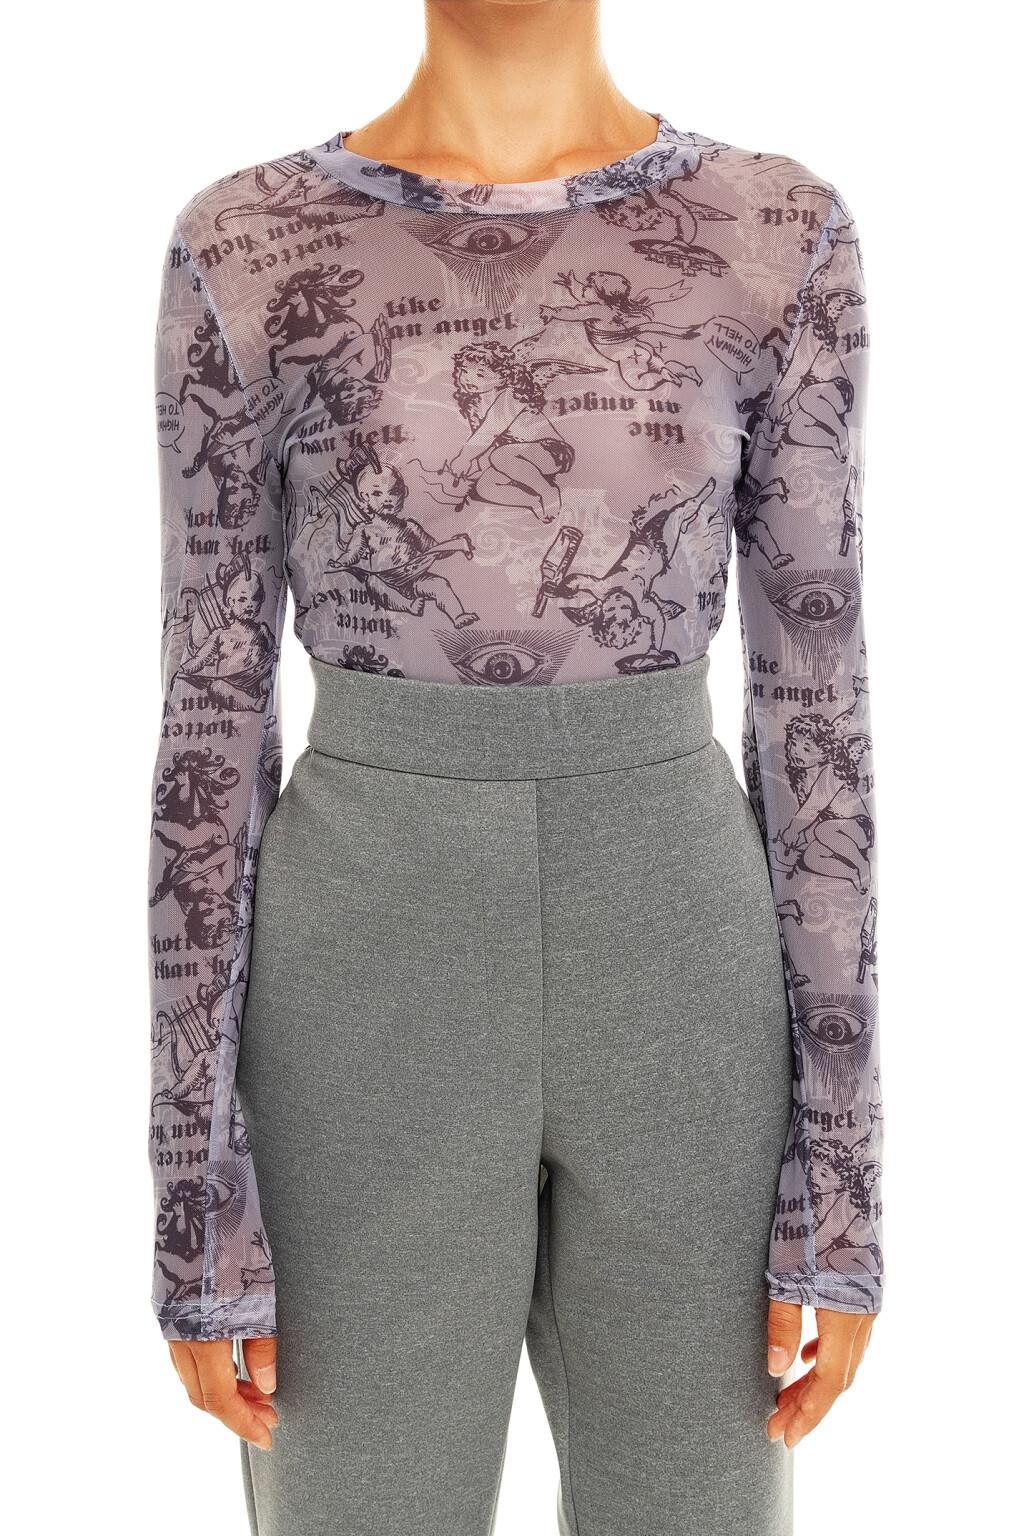 блузка (боди) женская